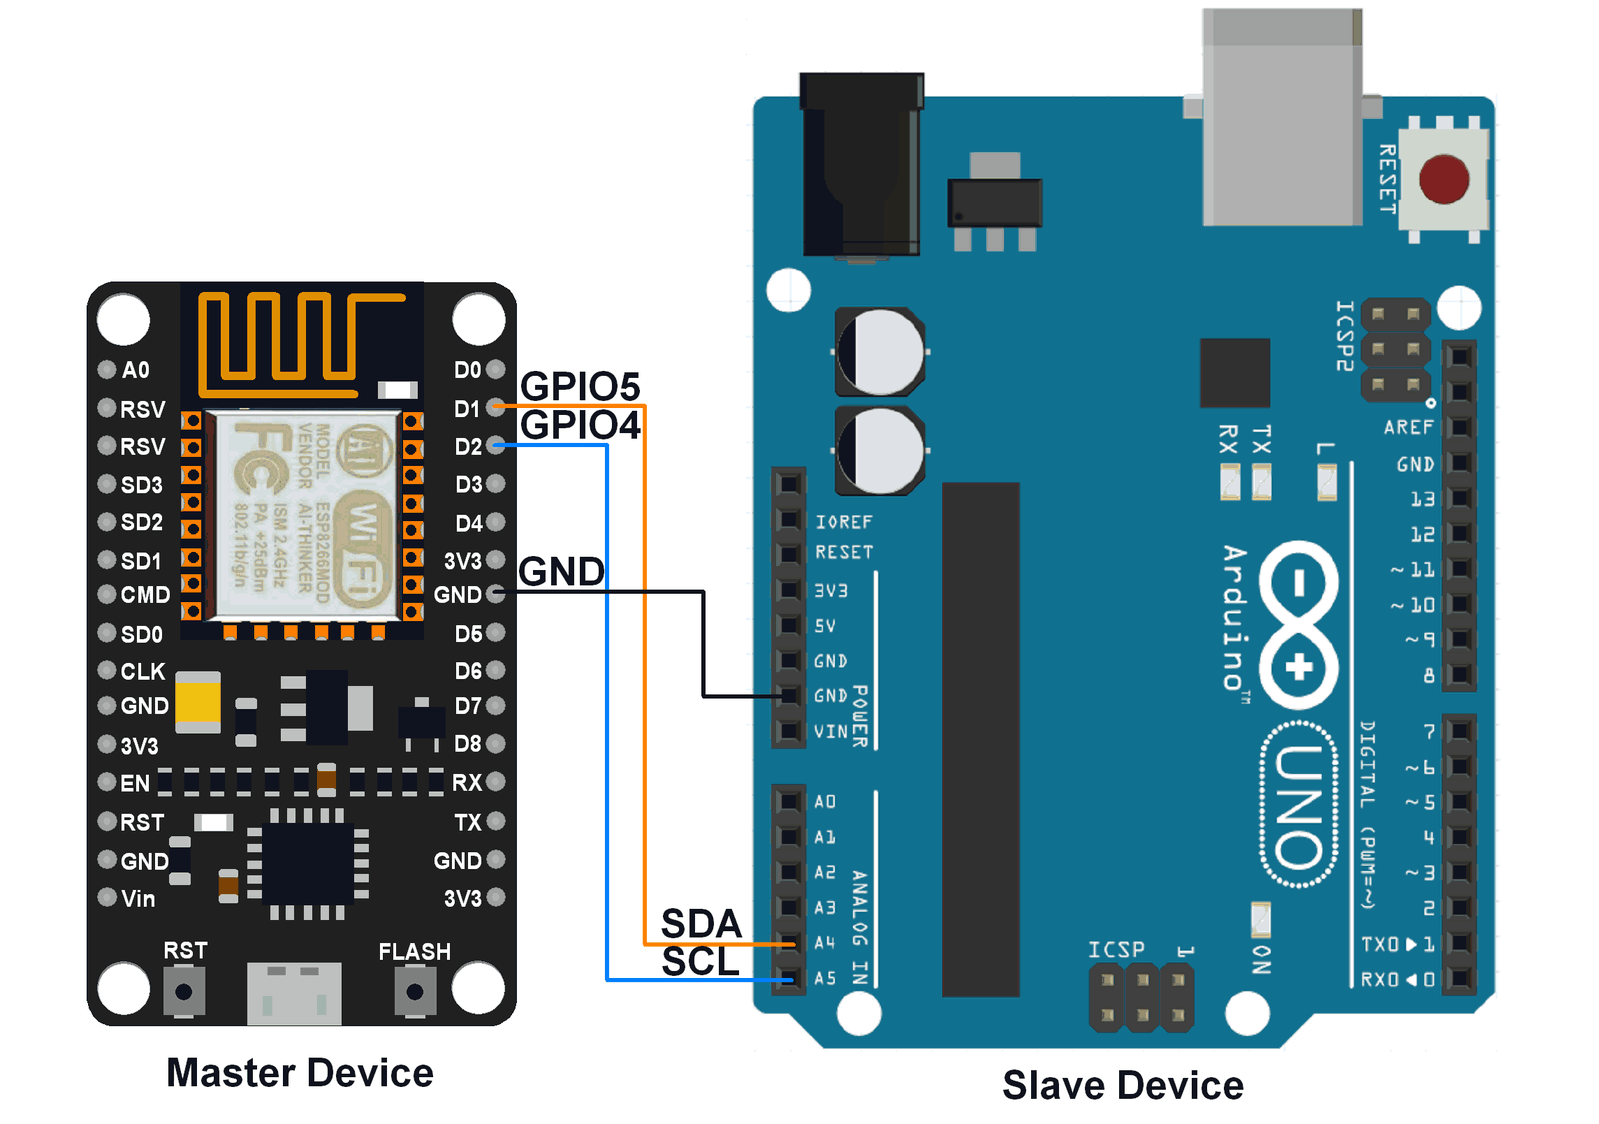 NodeMCU I2C với Arduino IDE - Giao tiếp Arduino với NodeMCU thông qua I2C